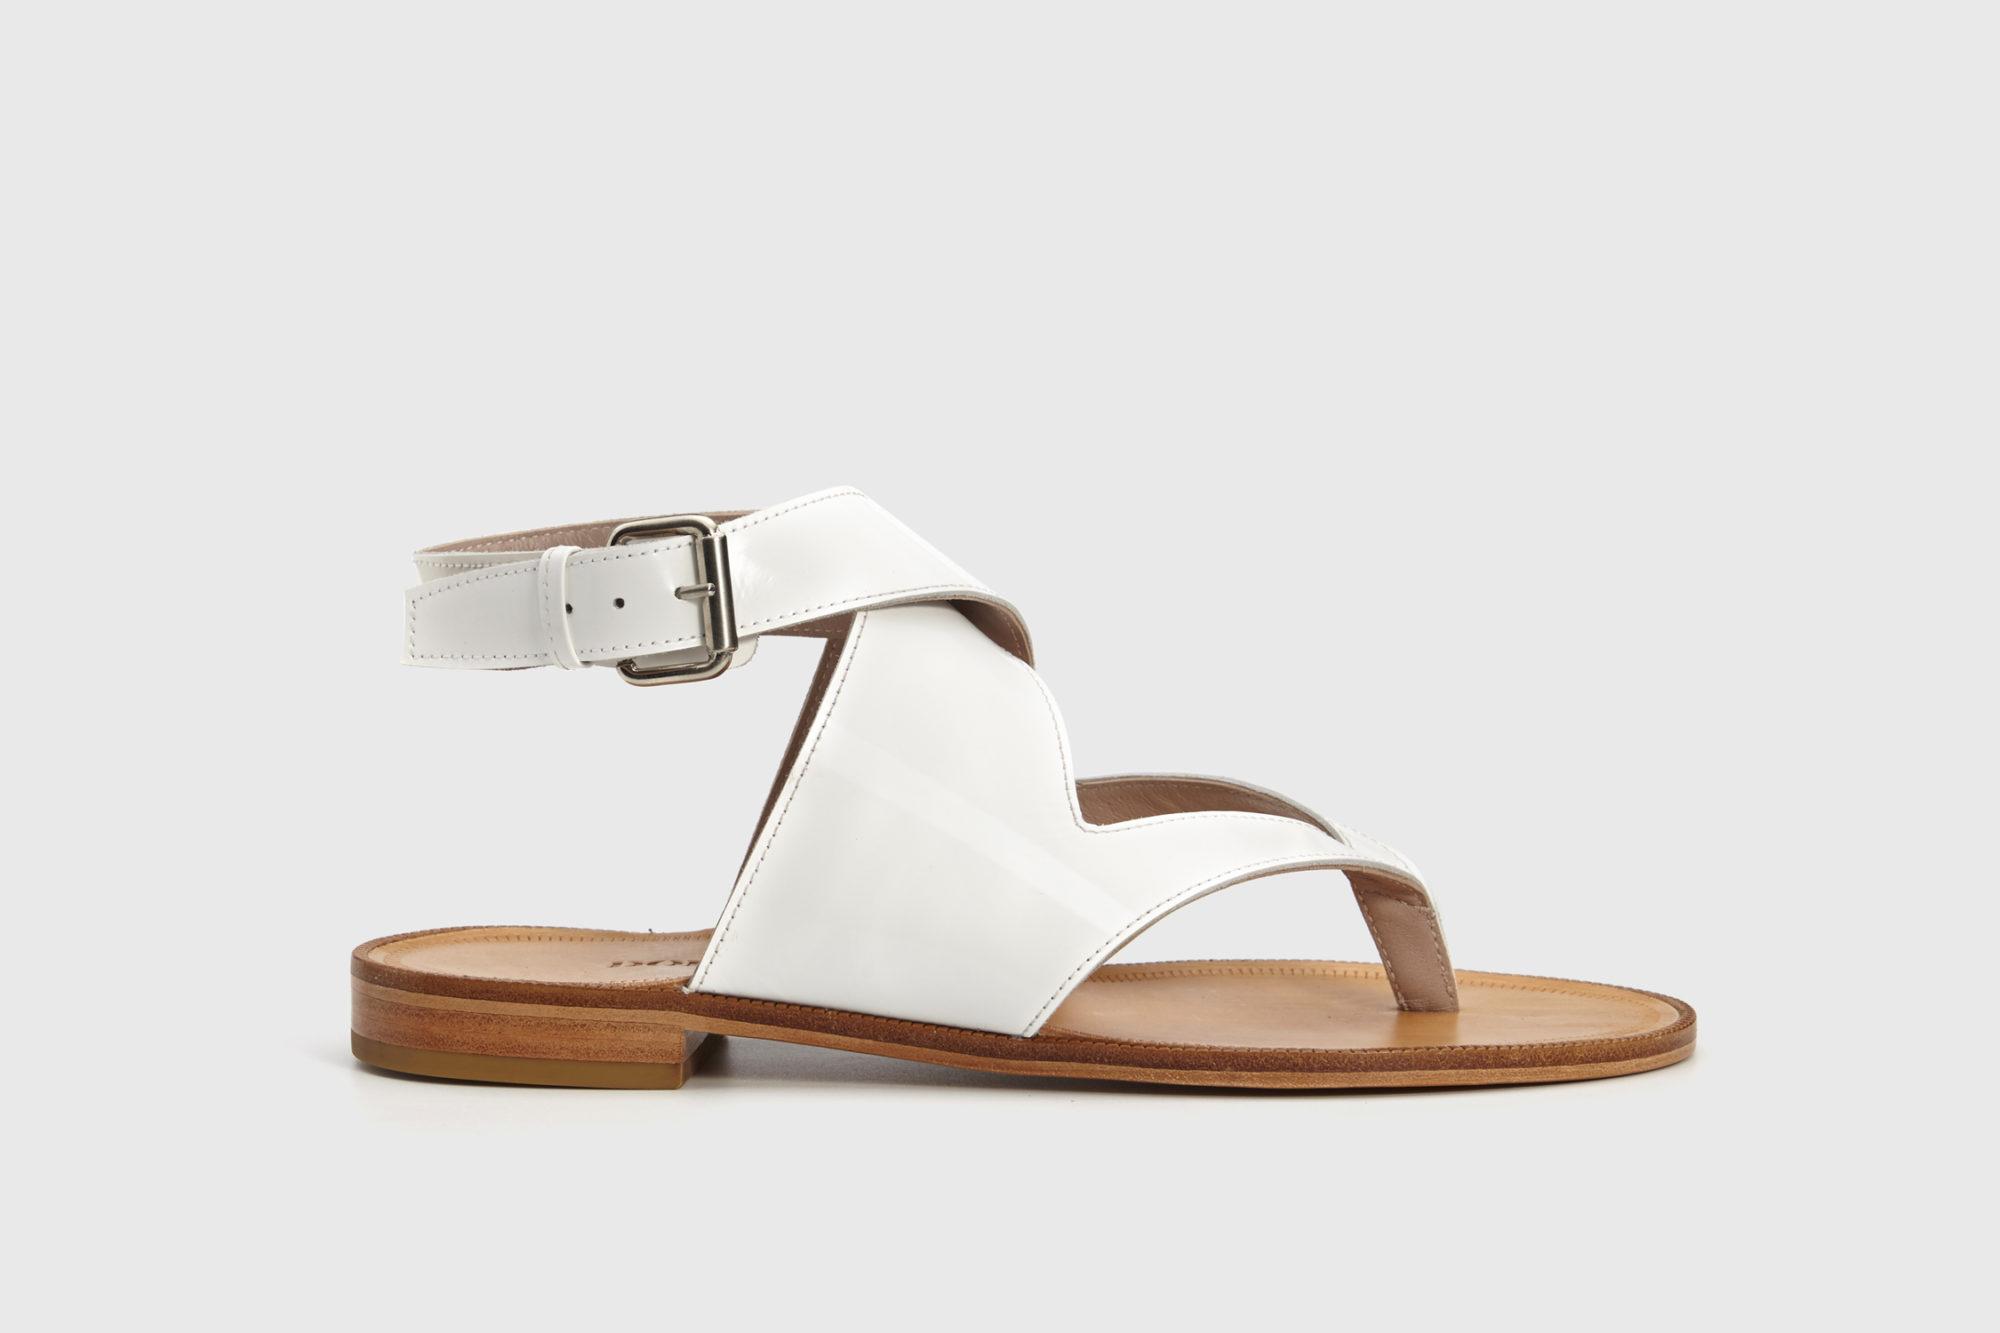 Dorotea sandalia plana Martina blanco ss18 perfil